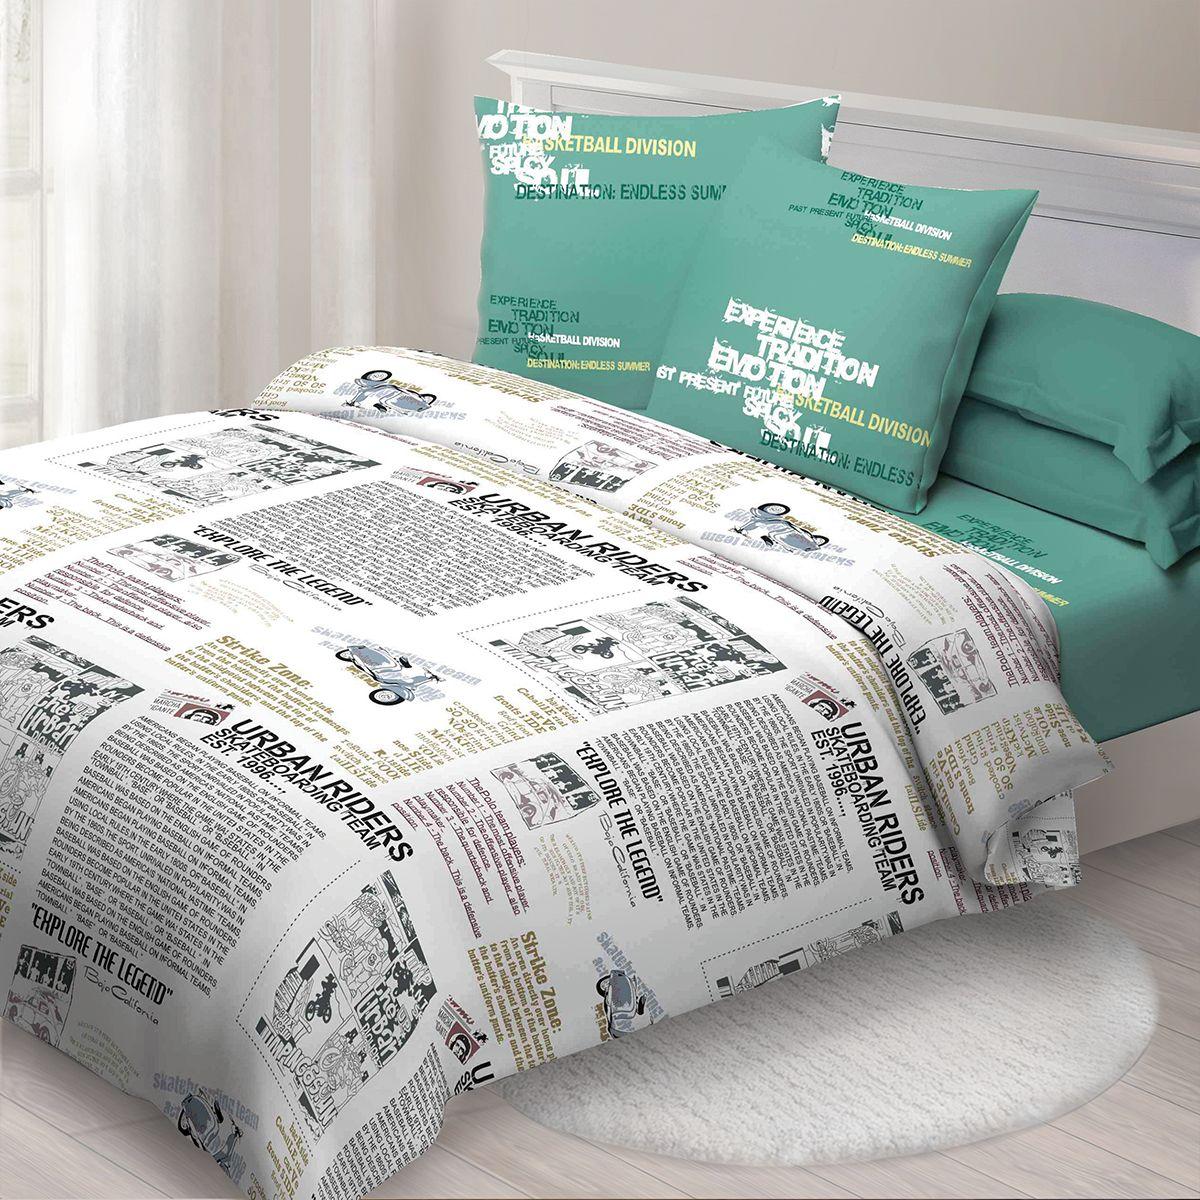 Комплект белья Спал Спалыч Новости, евро, наволочки 70x70, цвет: белый. 1629-182462